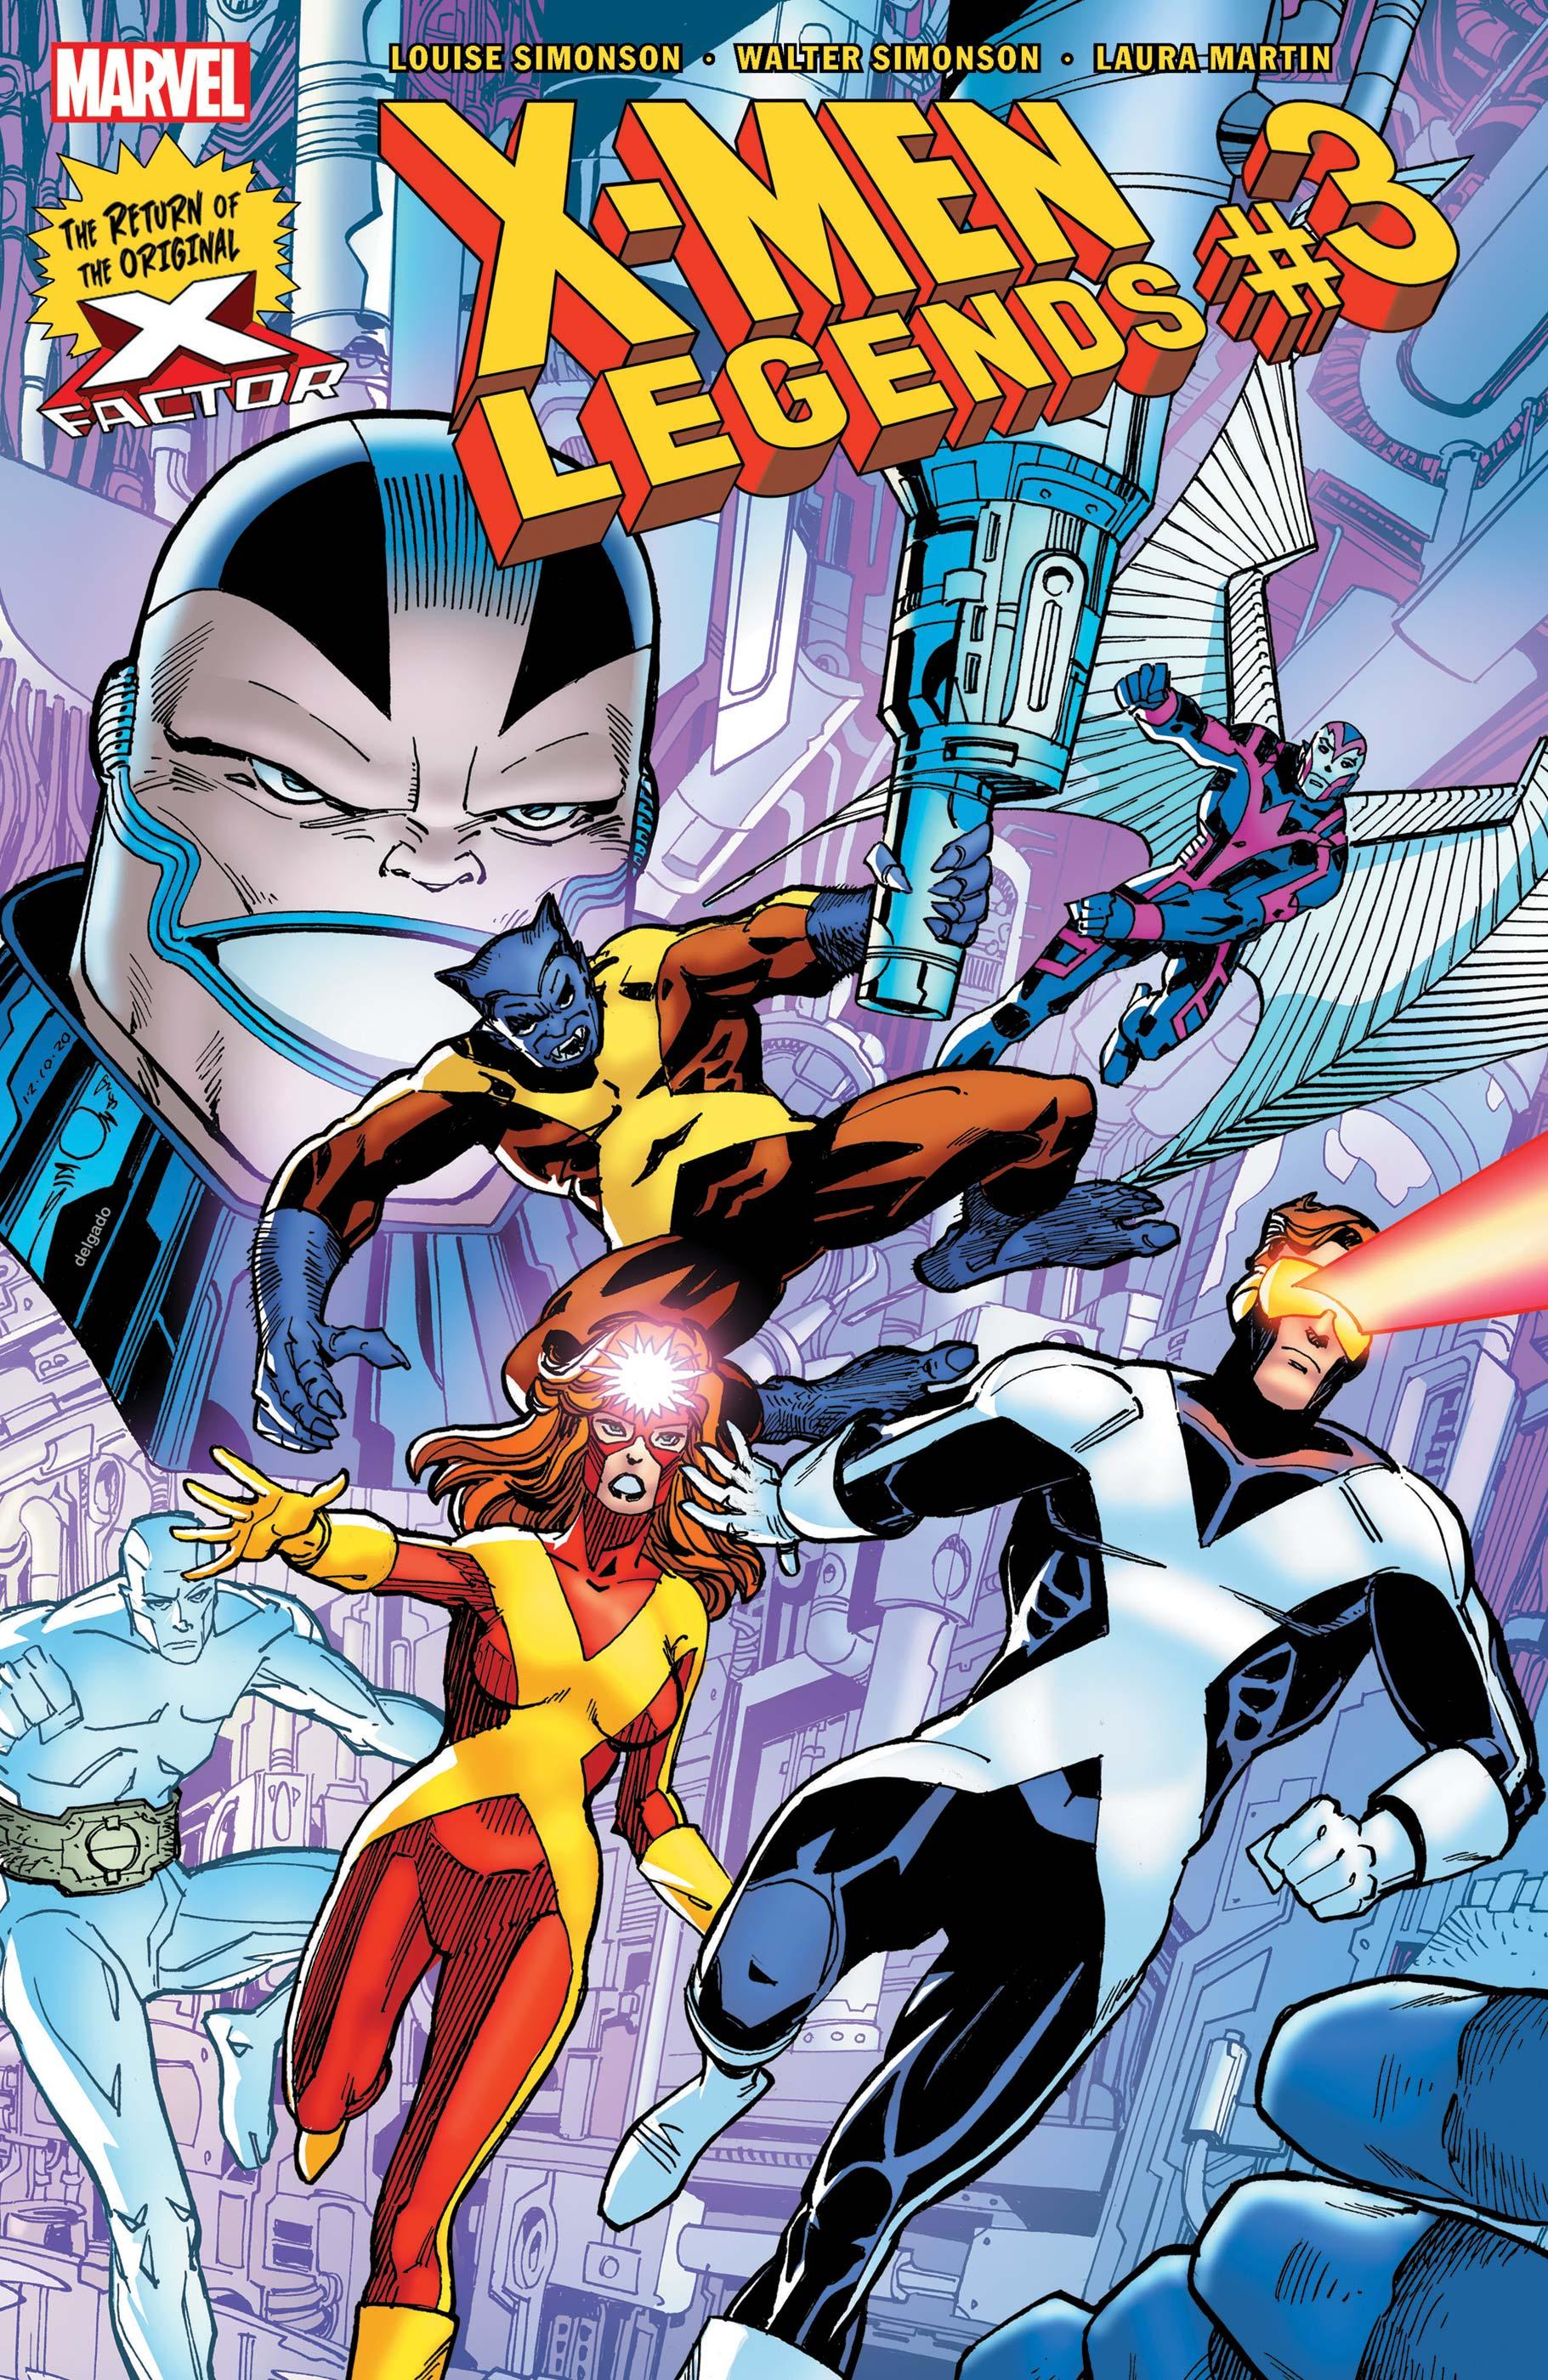 X-Men Legends (2021) #3